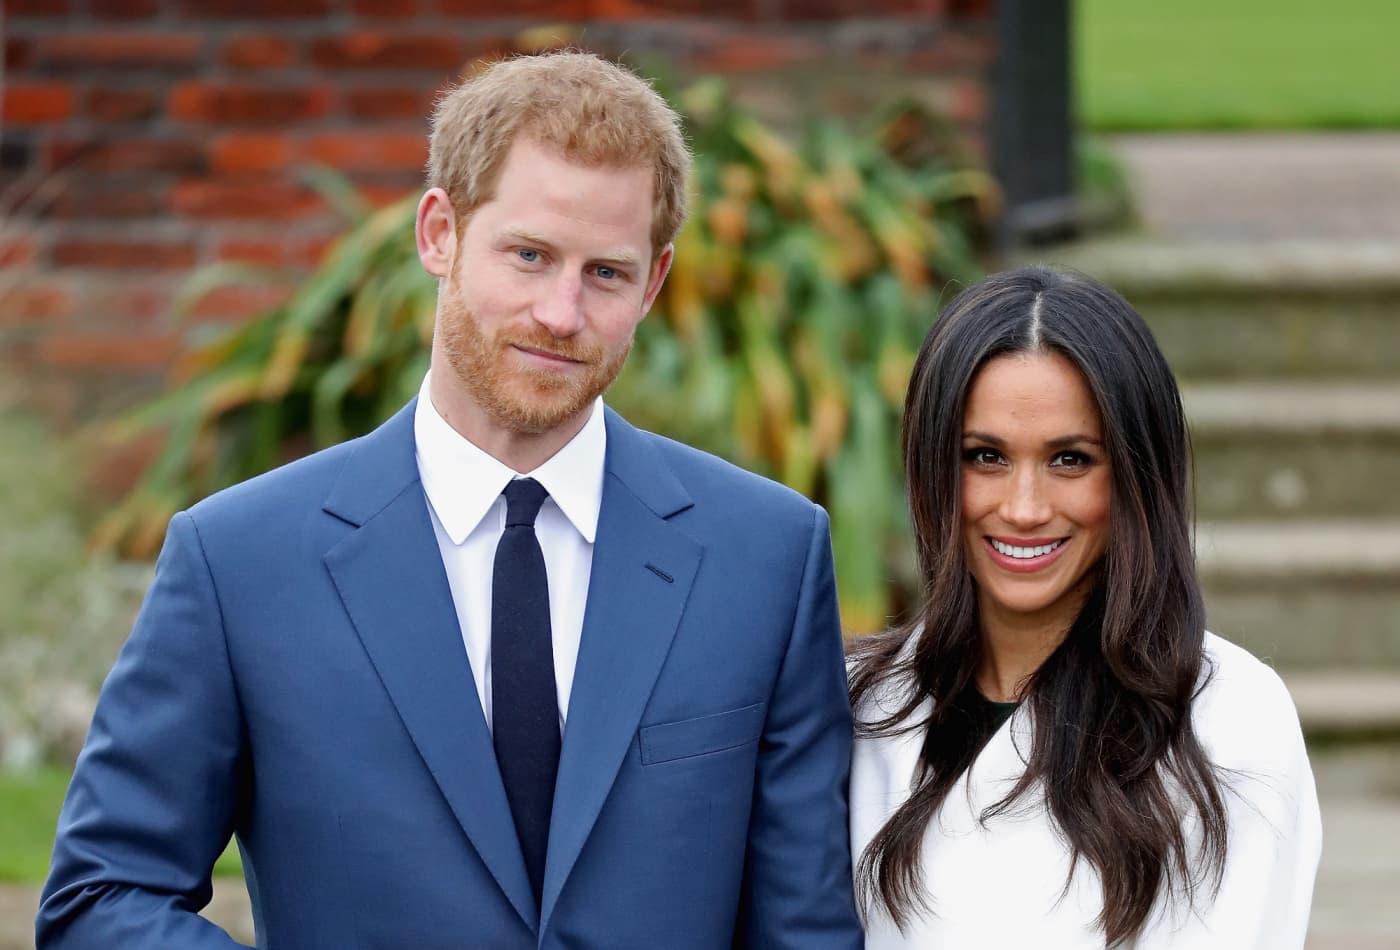 Royal Wedding Meghan Markle.Meghan Markle S Former Side Hustle May Be Useful At Her